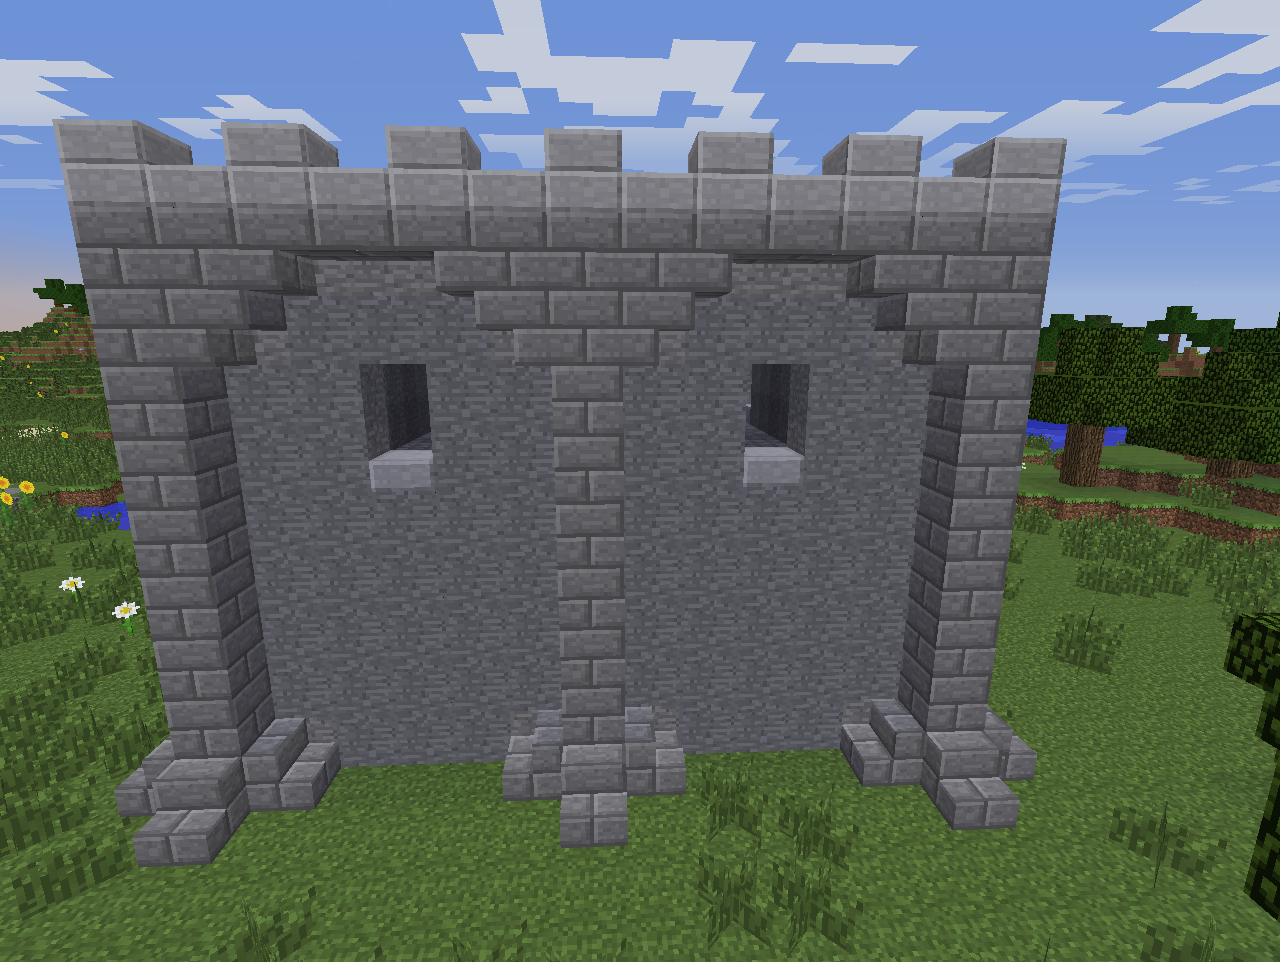 castle styling ideas pt1 pic2coltcoyote on deviantart